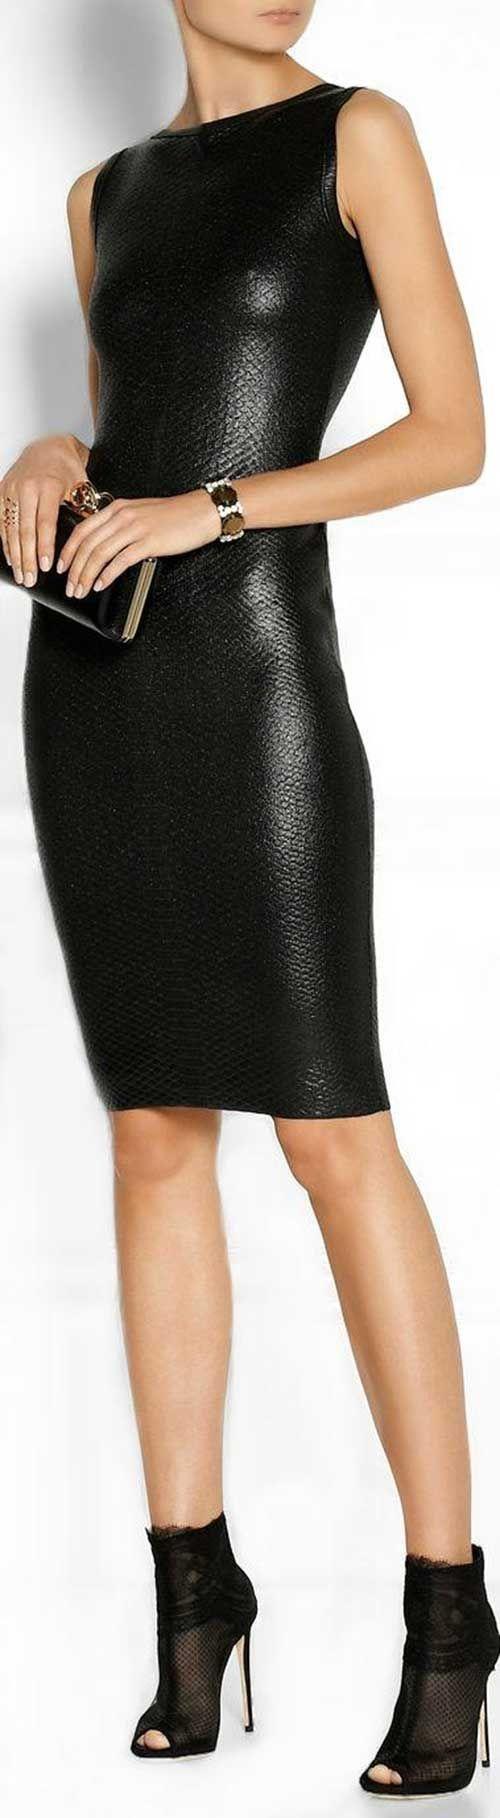 15 Sik Deri Elbise Modelleri Taki Aksesuar Kozmetik Saat Canta Gunes Gozlugu Moda Blogu Fashion Little Black Dress Leather Mini Dress